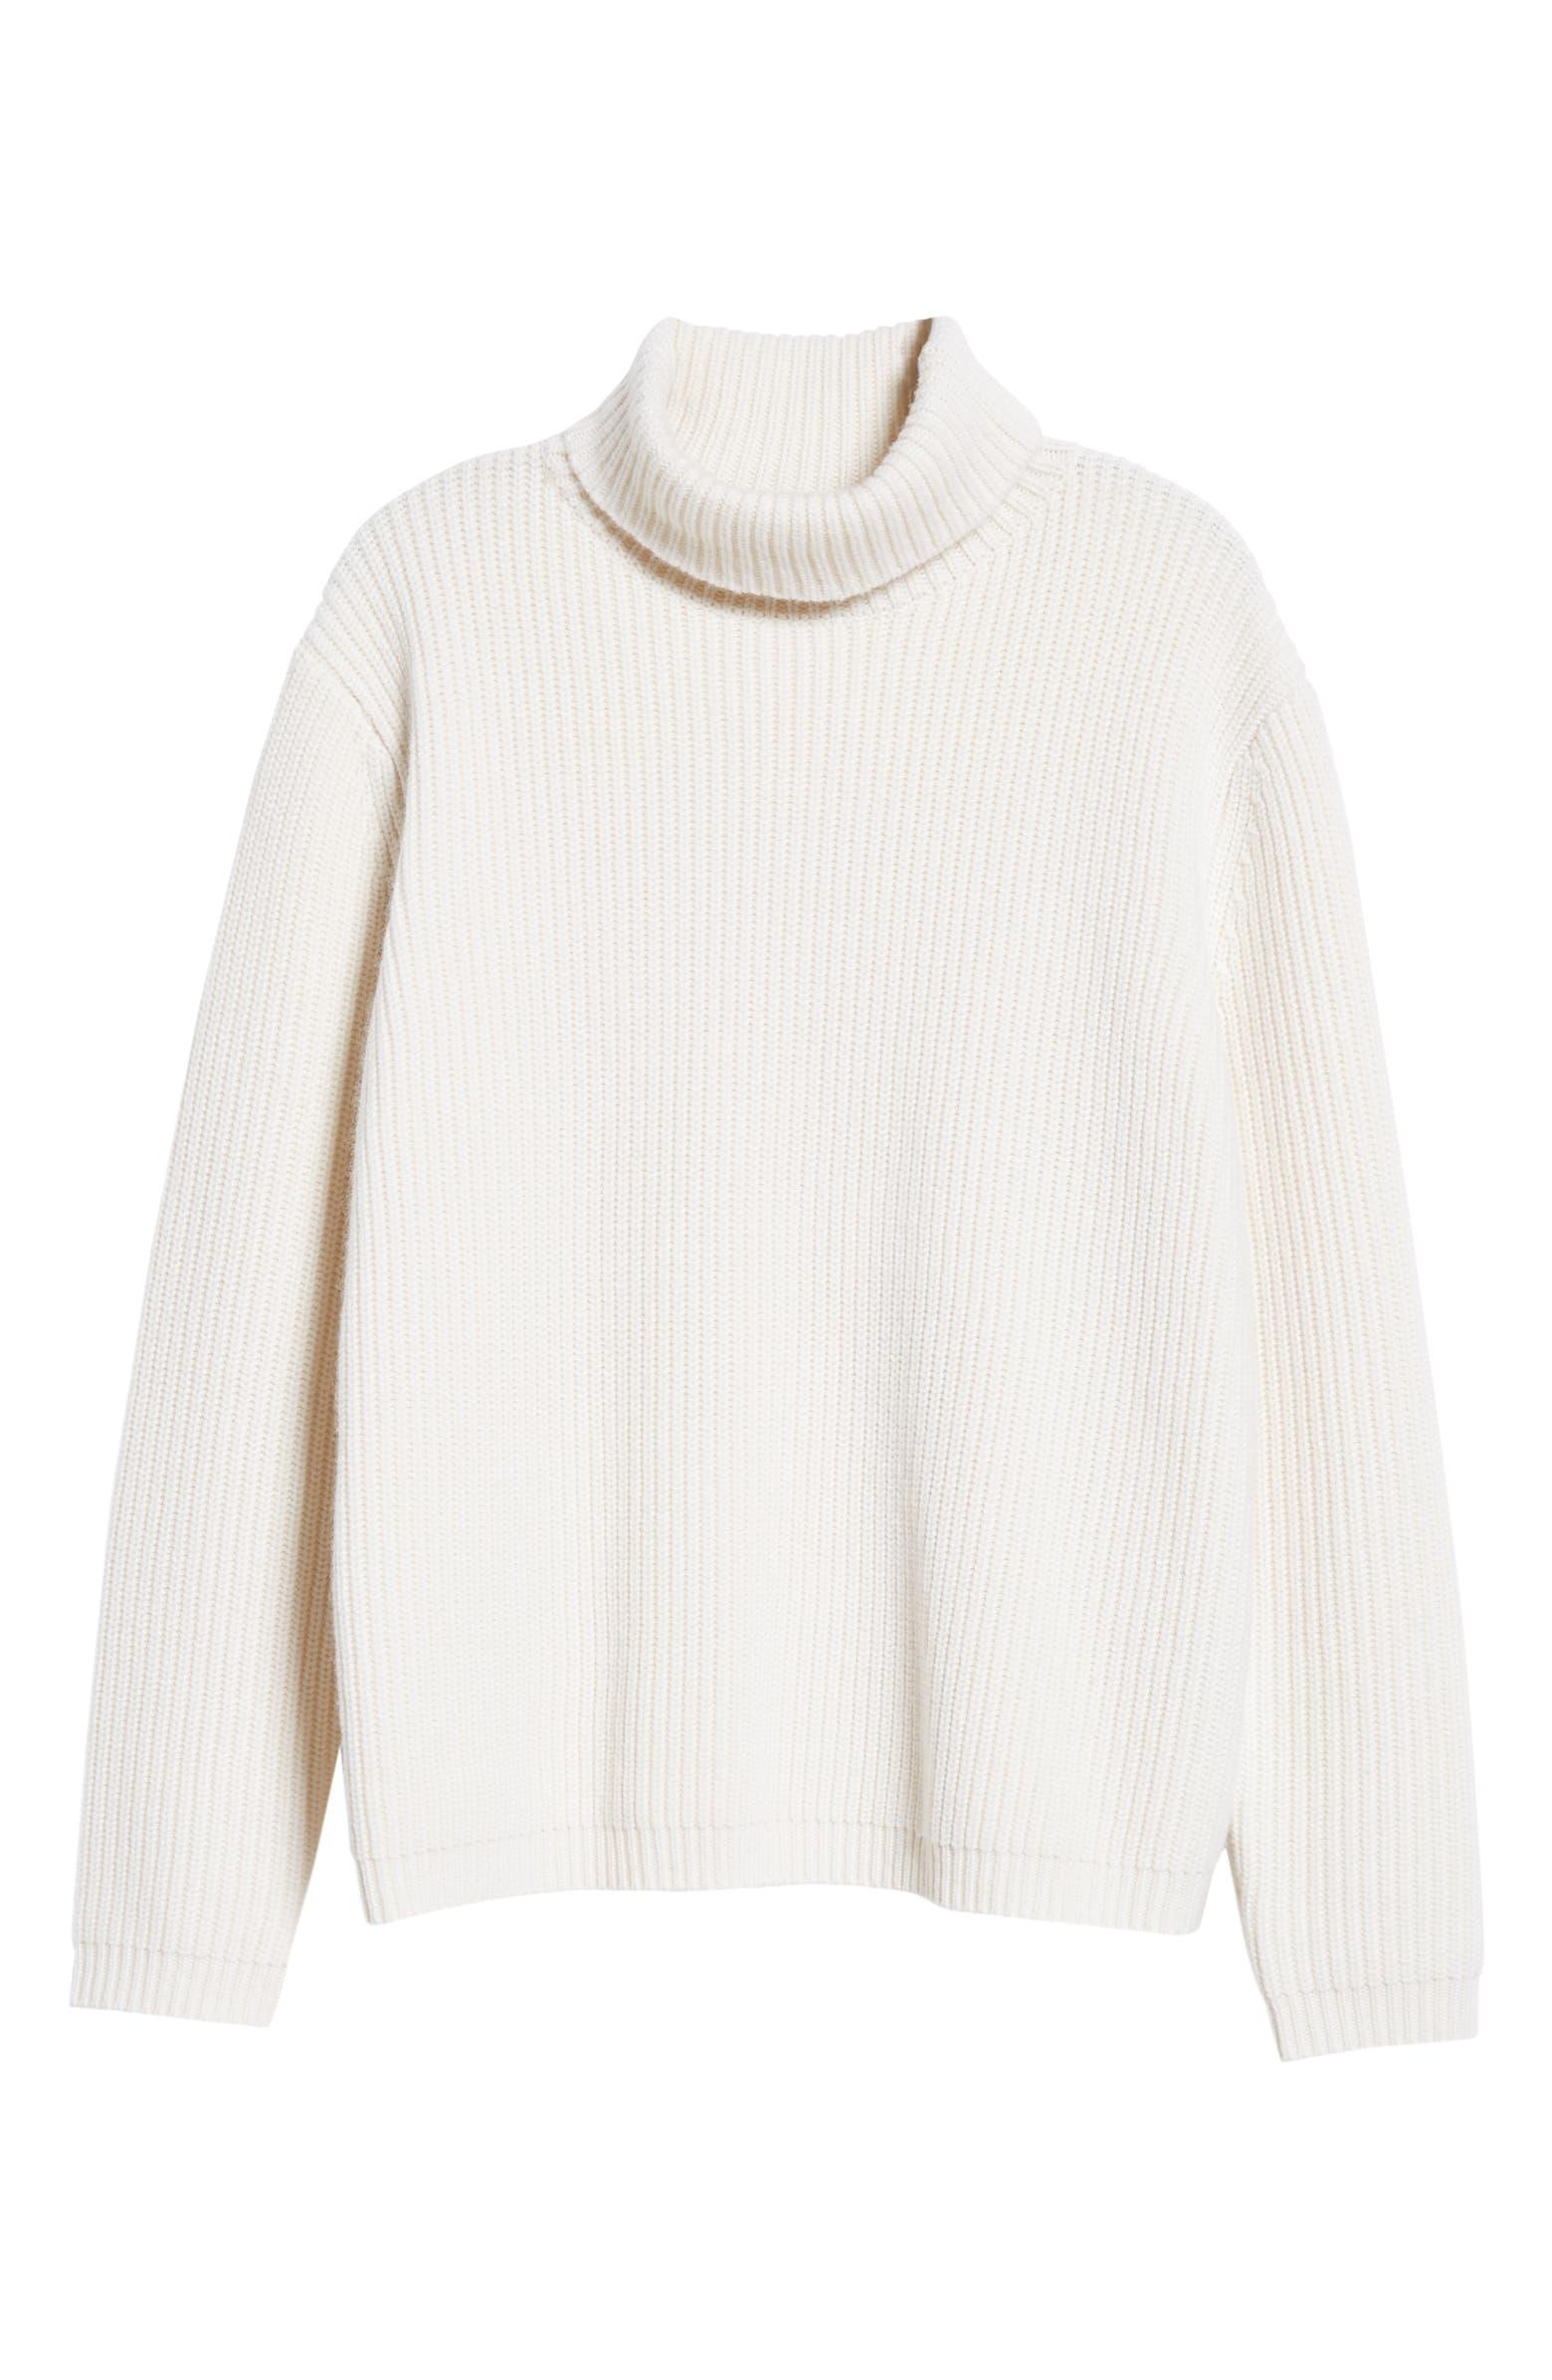 Ribbed Cashmere Turtleneck Sweater JENNI KAYNE